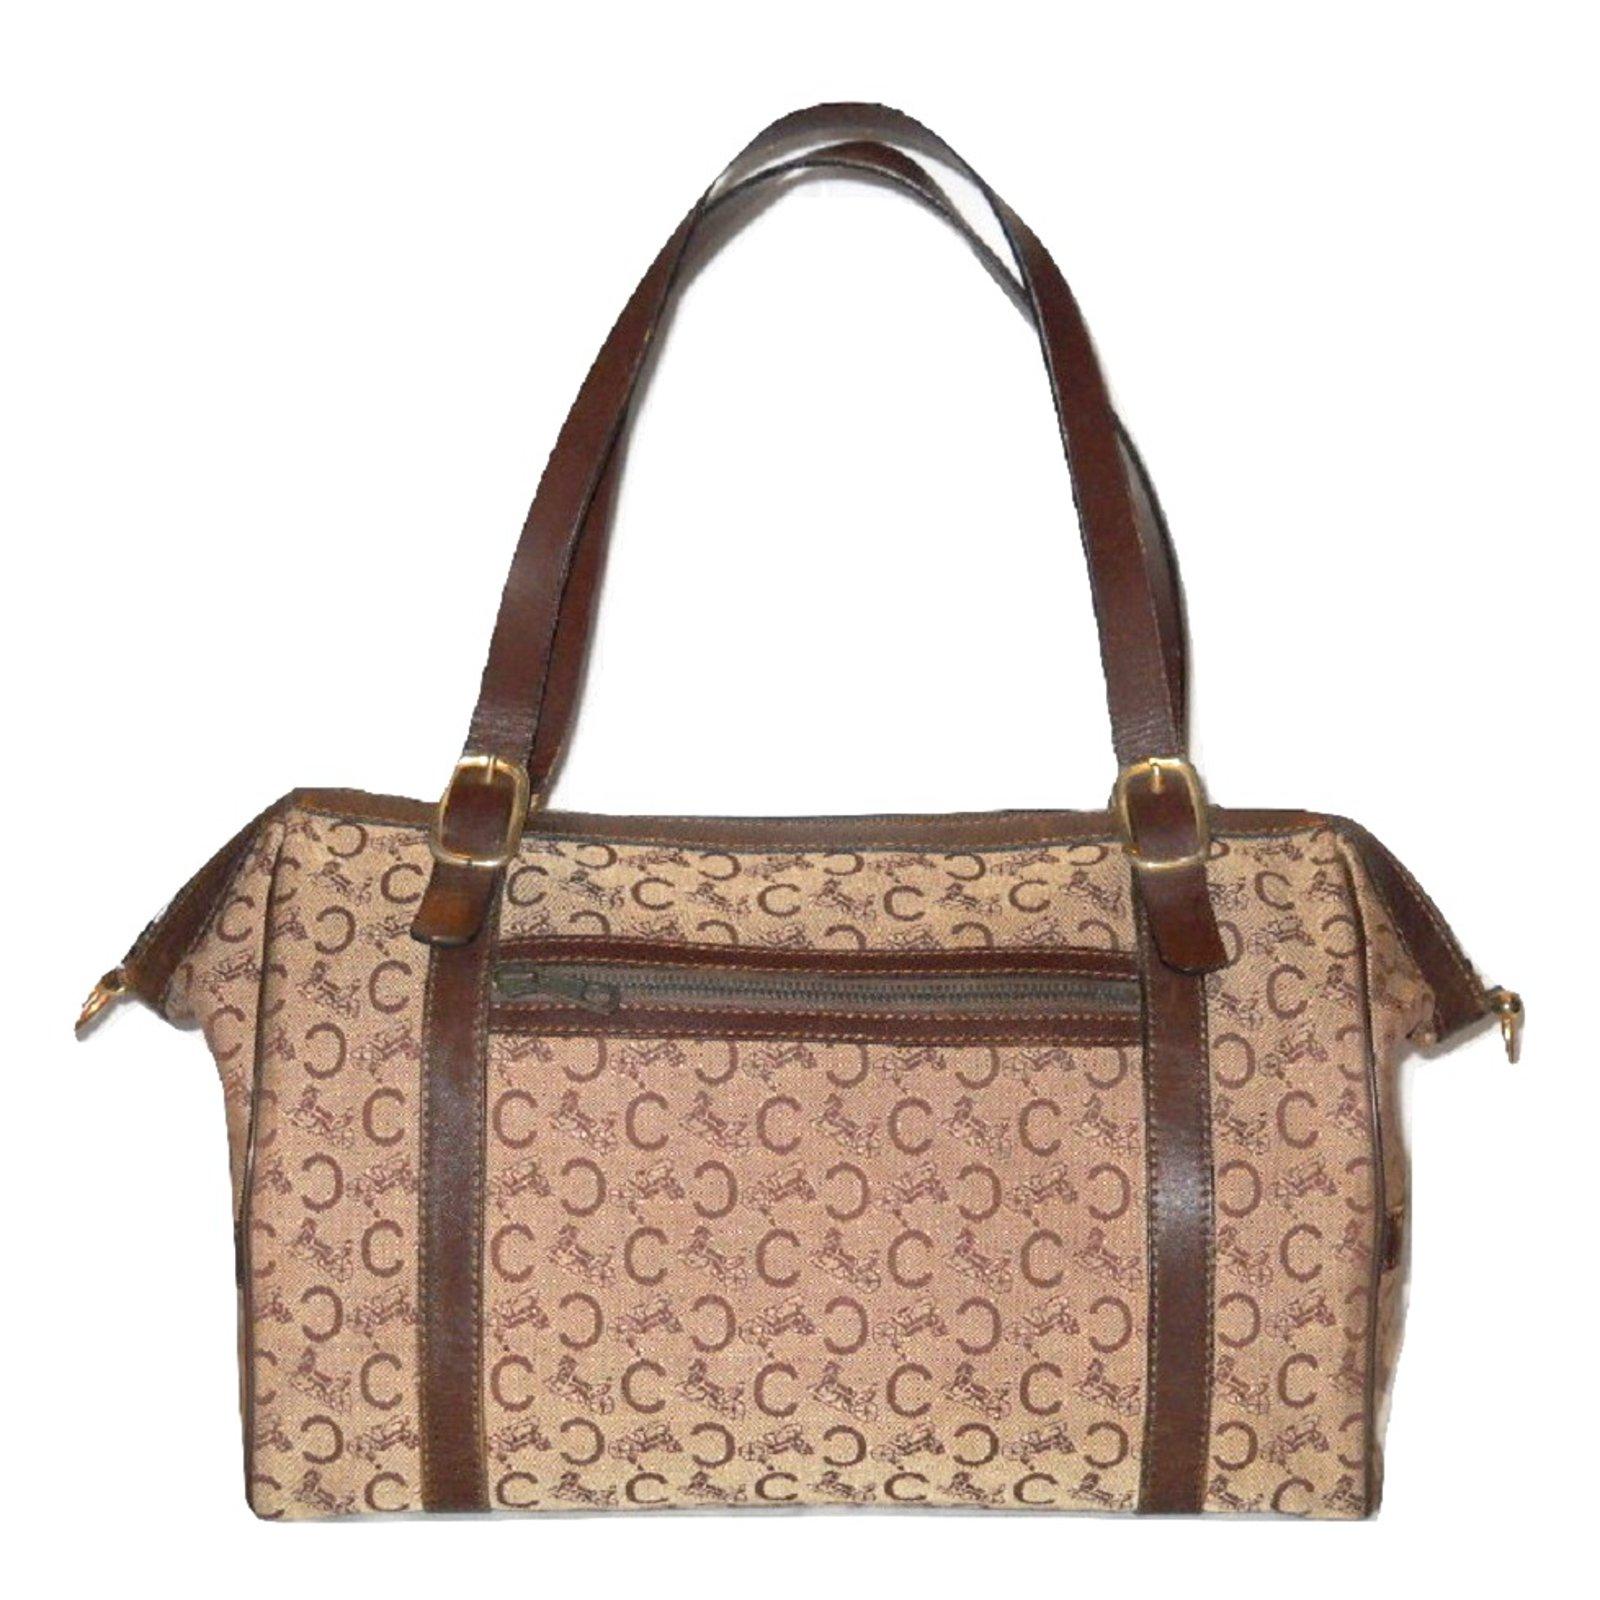 Céline CELINE vintage travel bag Boston canvas Sulky brown Travel bag  Leather,Cloth Brown ref 9a61b204eb